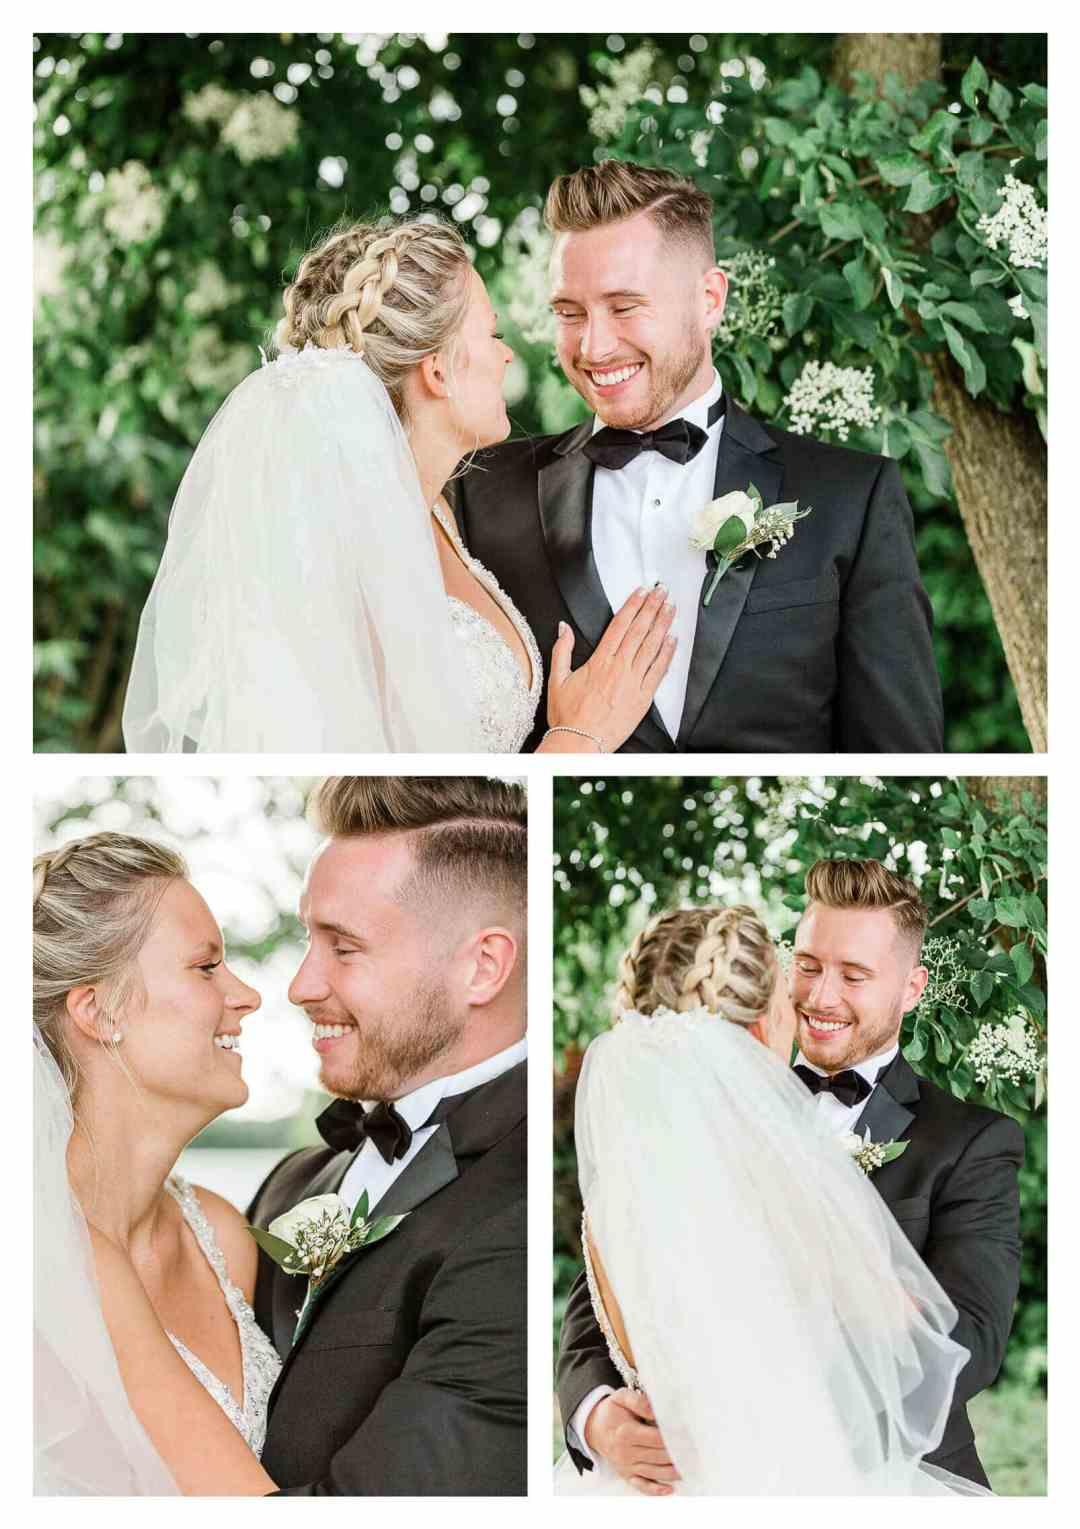 Zinnia Gardens wedding couple in Surrey | Zinnia Gardens photographer